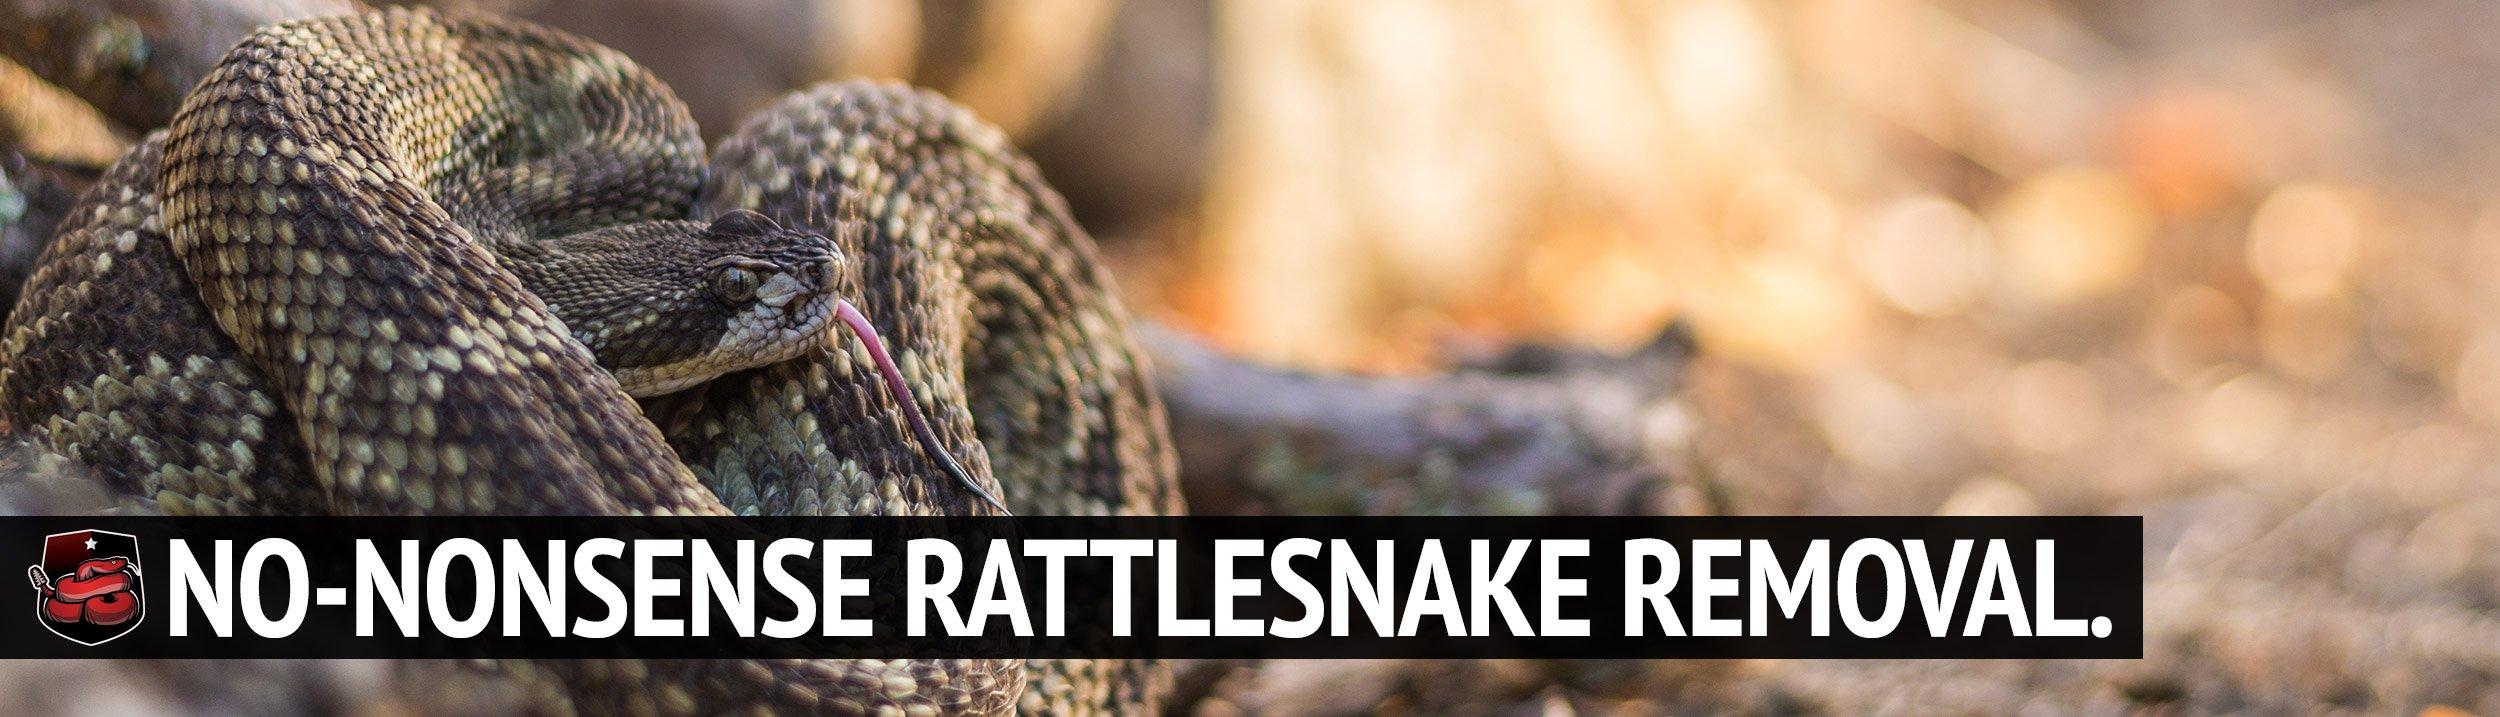 s6 | Rattlesnake Removal | Placer Snake Removal